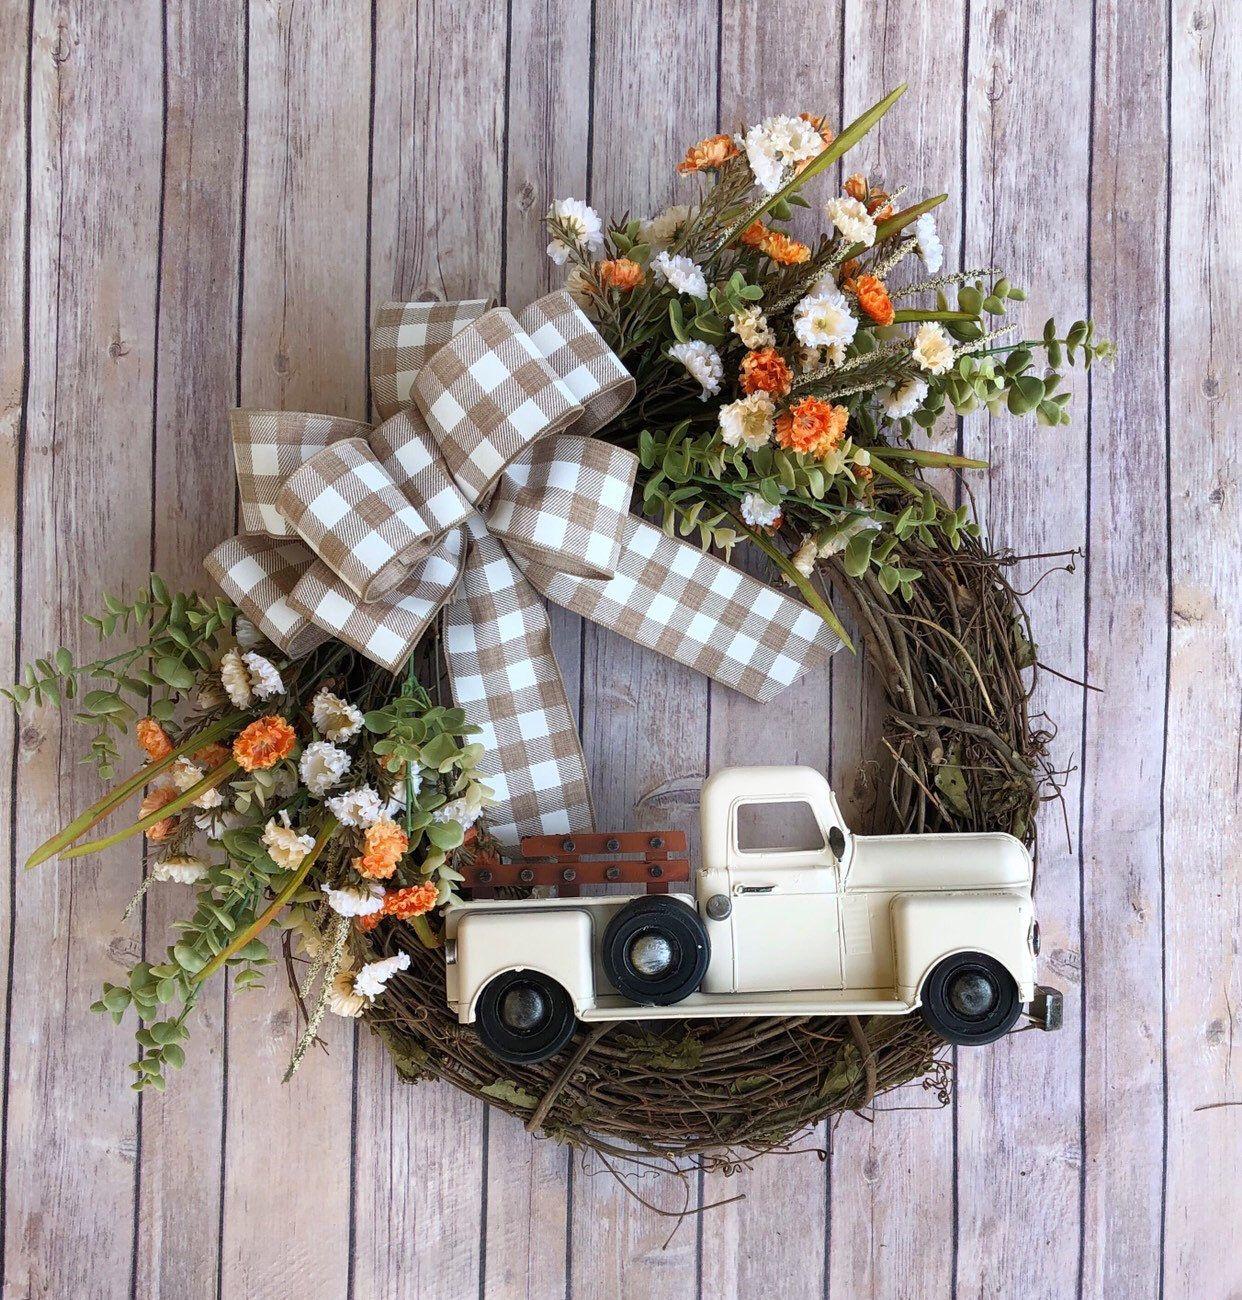 Photo of Fall Wreath | Truck Wreath | Front Door Wreath | Farmhouse Wreath | Eucalyptus Wreath | Grapevine Wreath | Metal truck decor